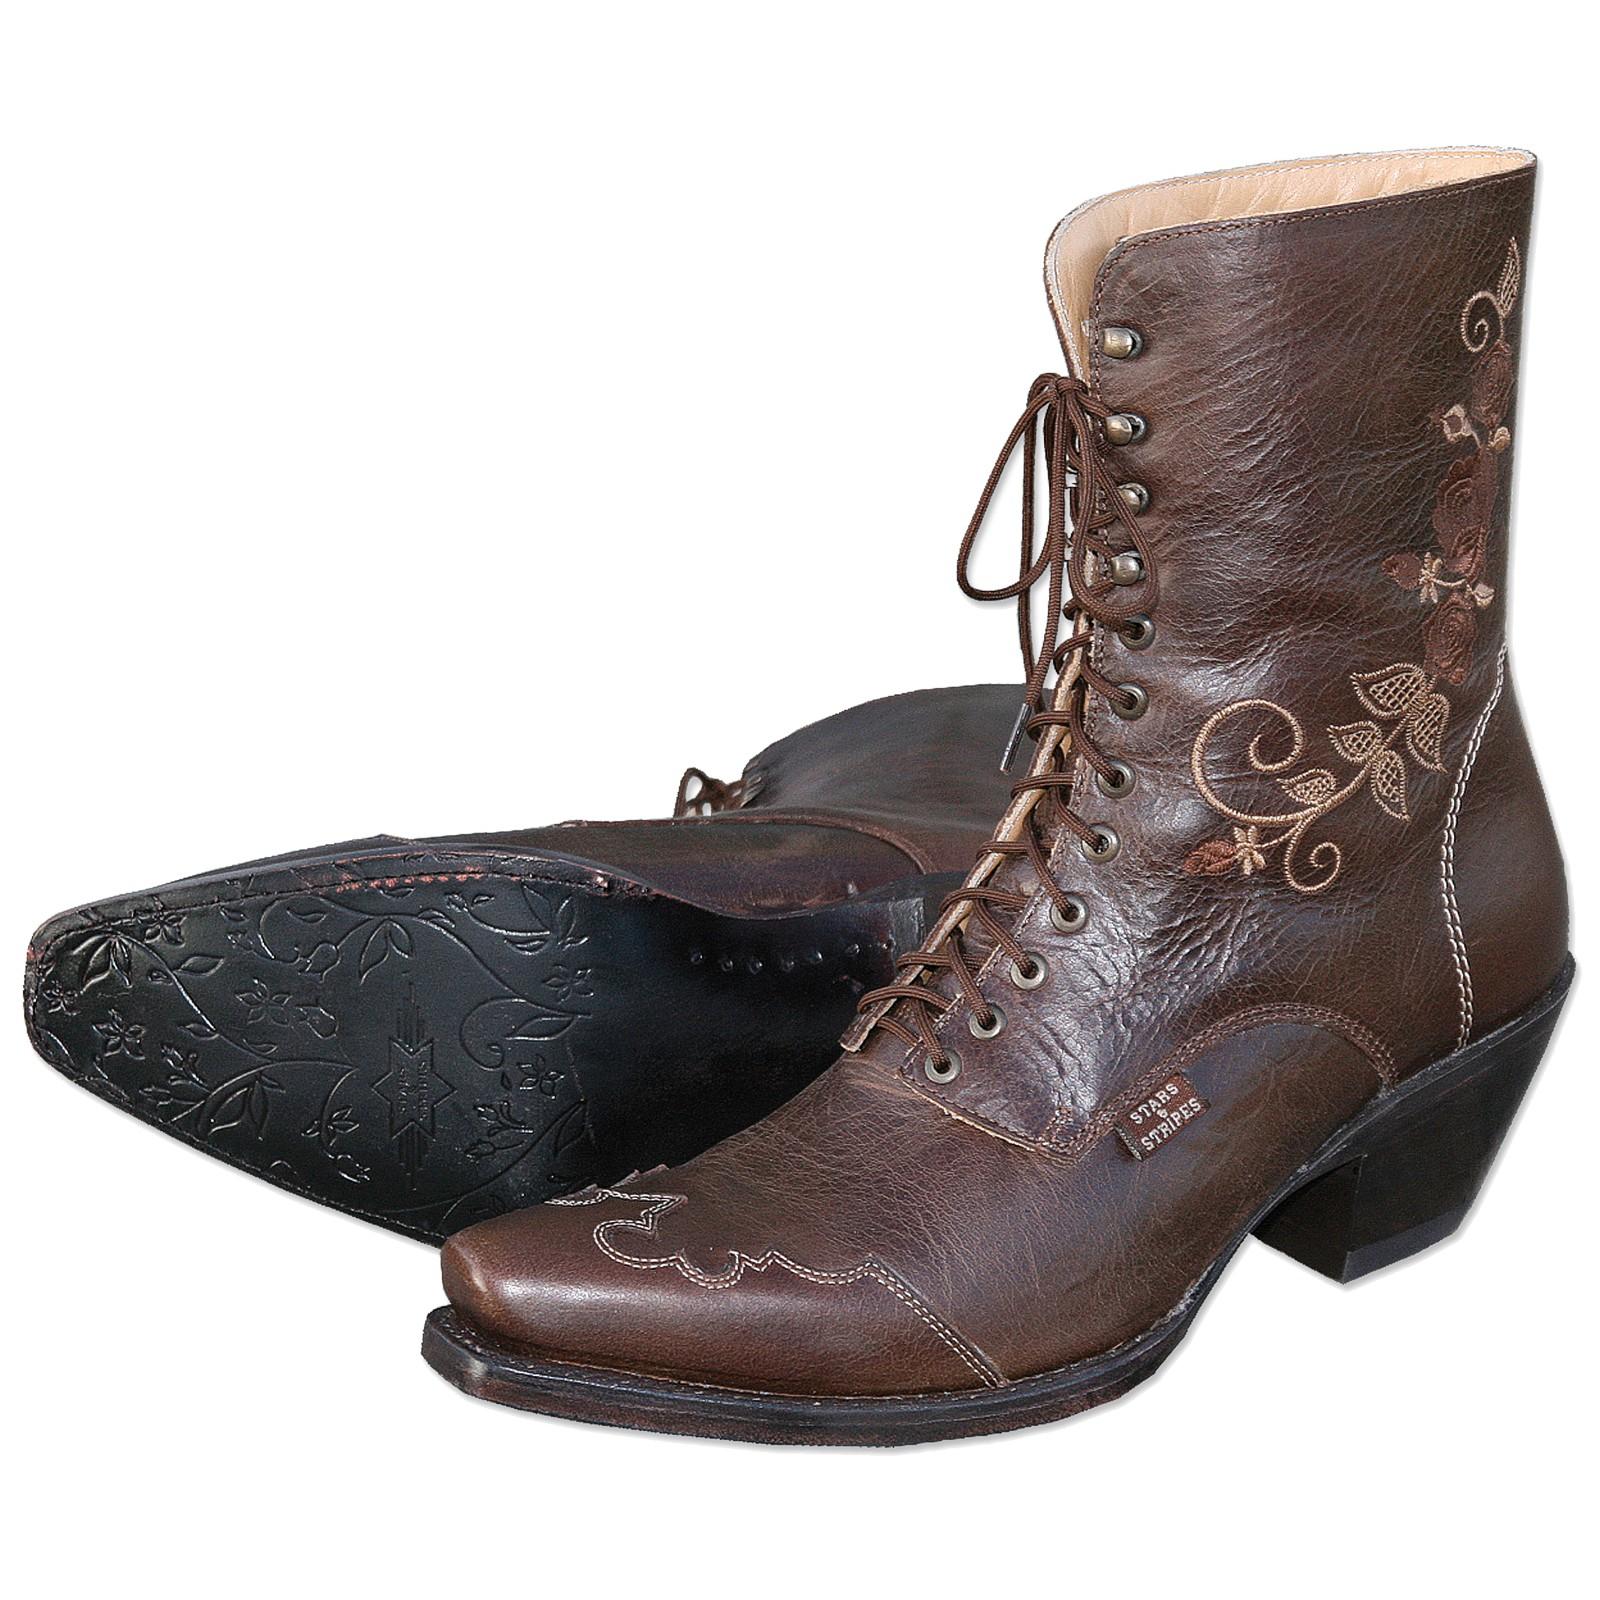 Stars & Stripes Damen Stiefel Western Boots »ROSI« Braun